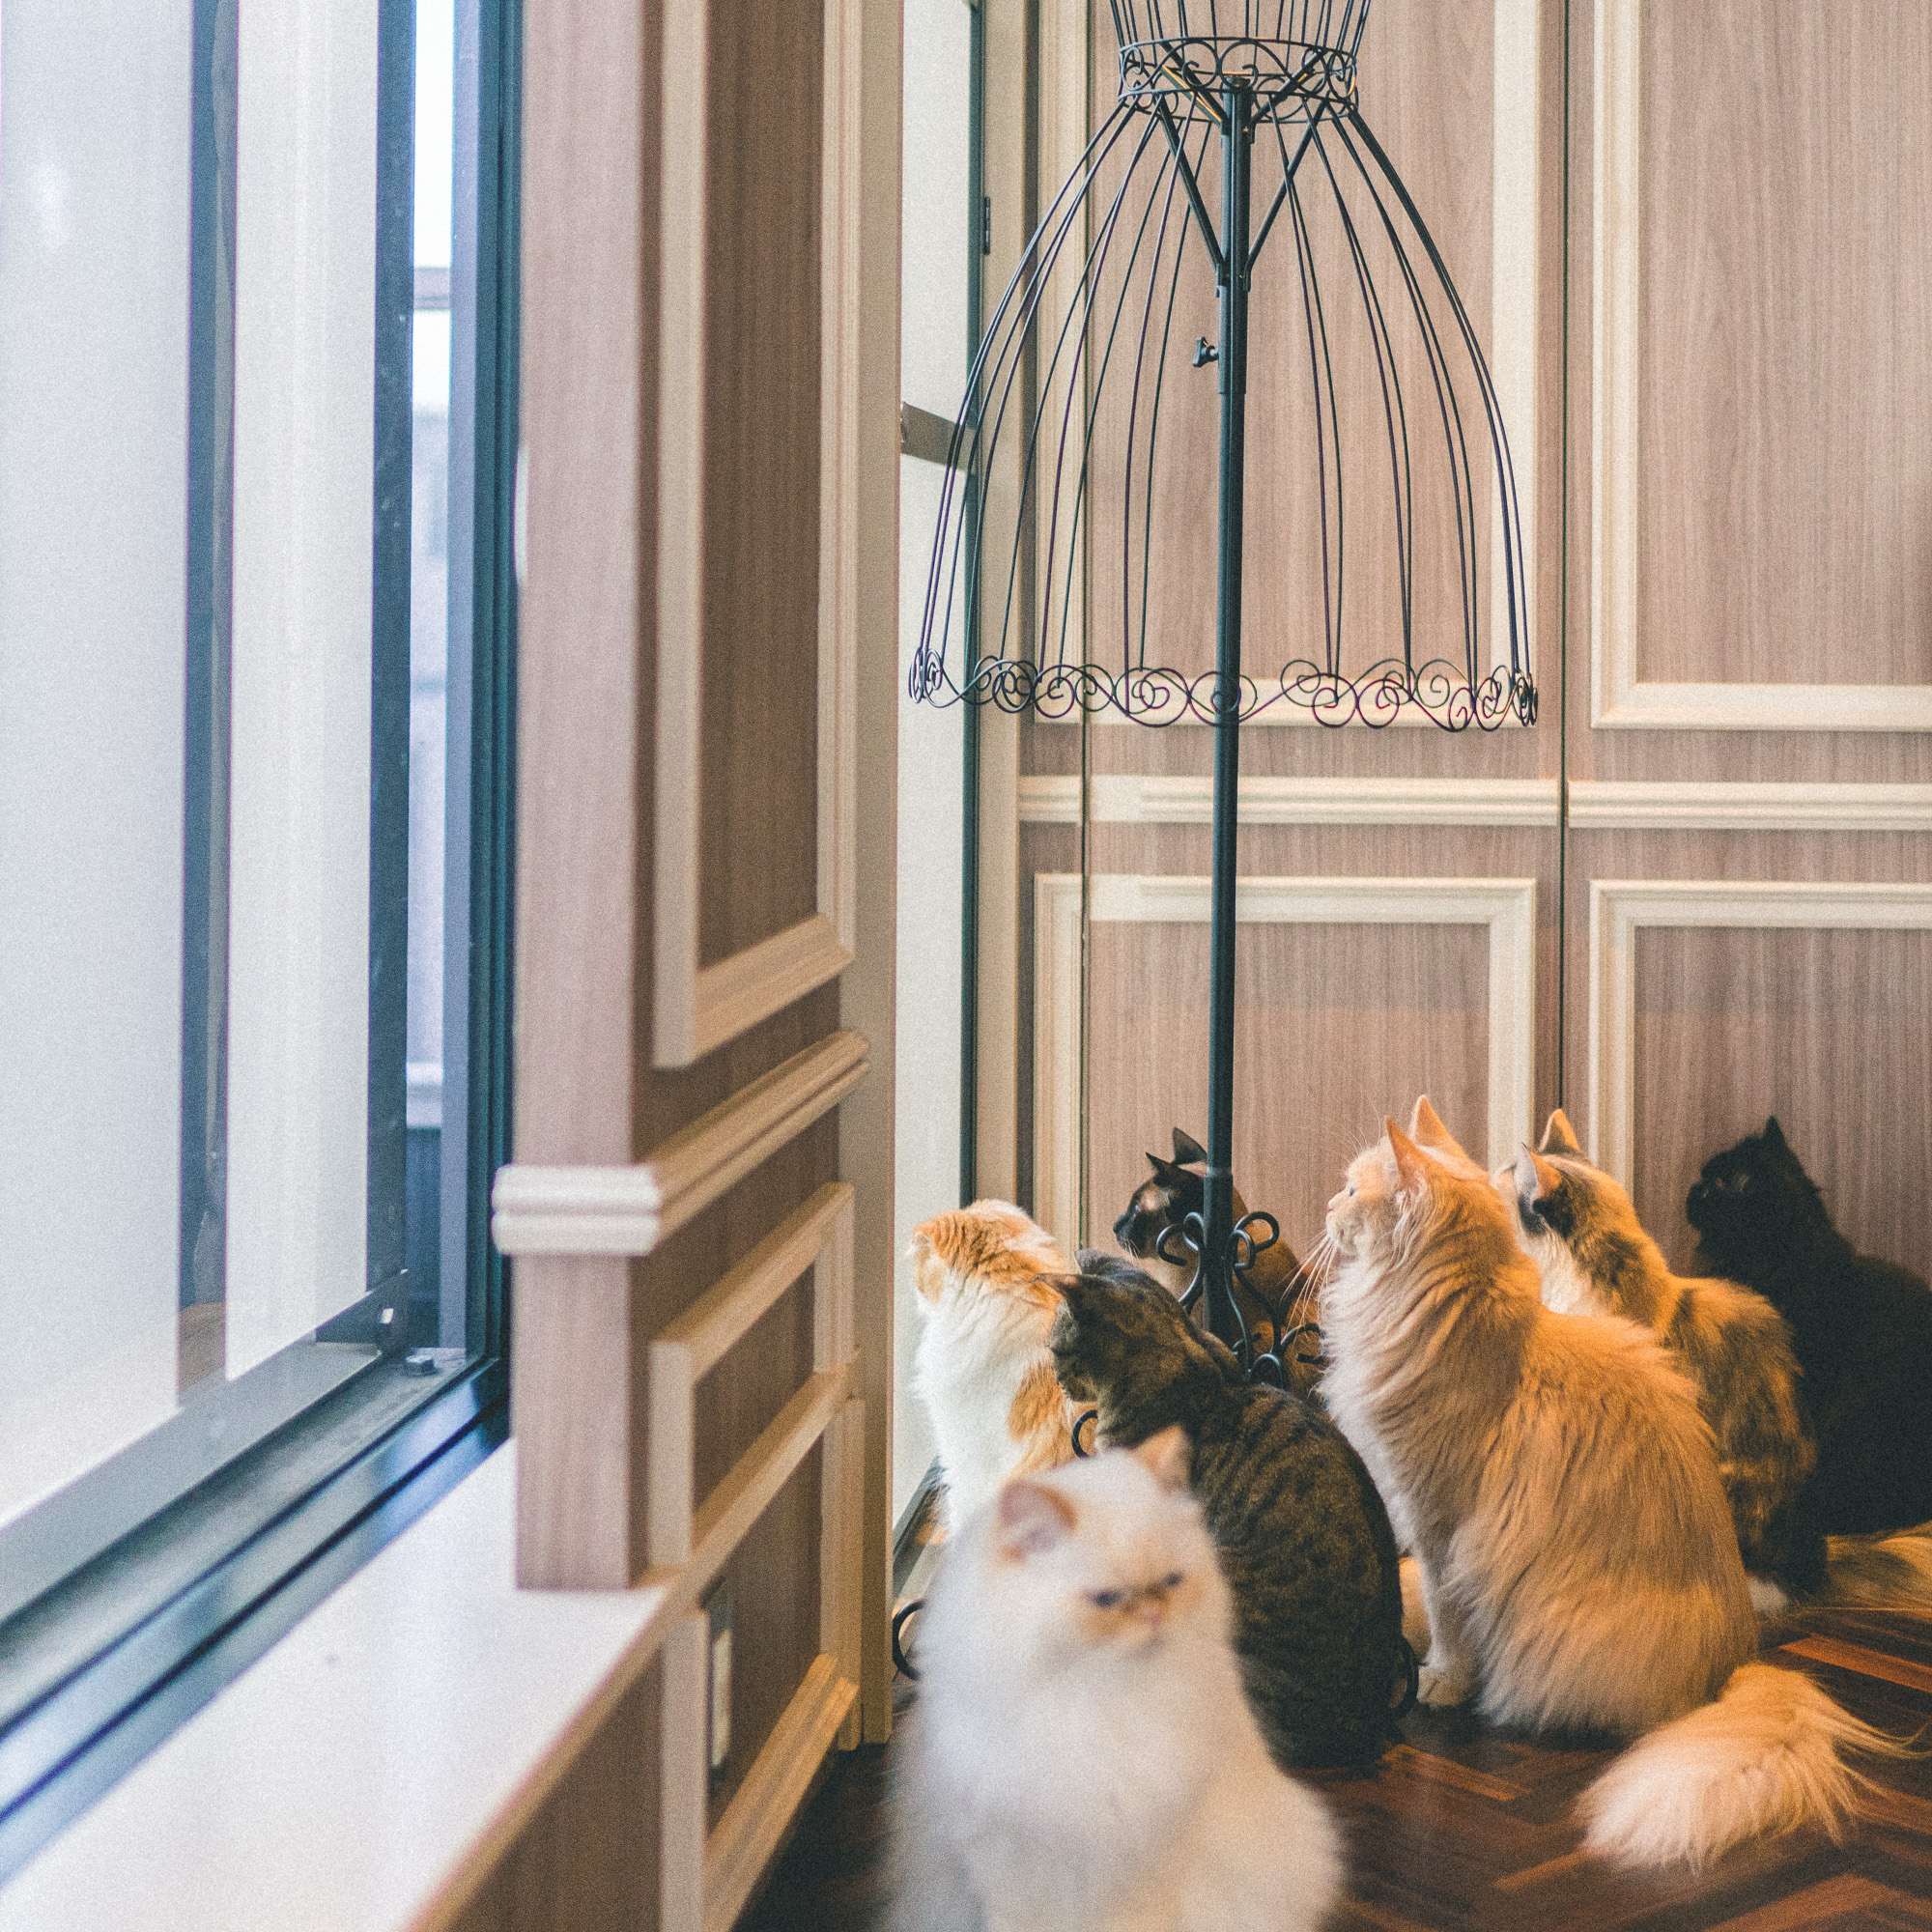 The Complete Tokyo Travel Guide | City Guides | Japan Travel Itinerary | Shinjuku Shibuya Harujuku Neighborhood Travel Tips | Cat Cafe Mocha